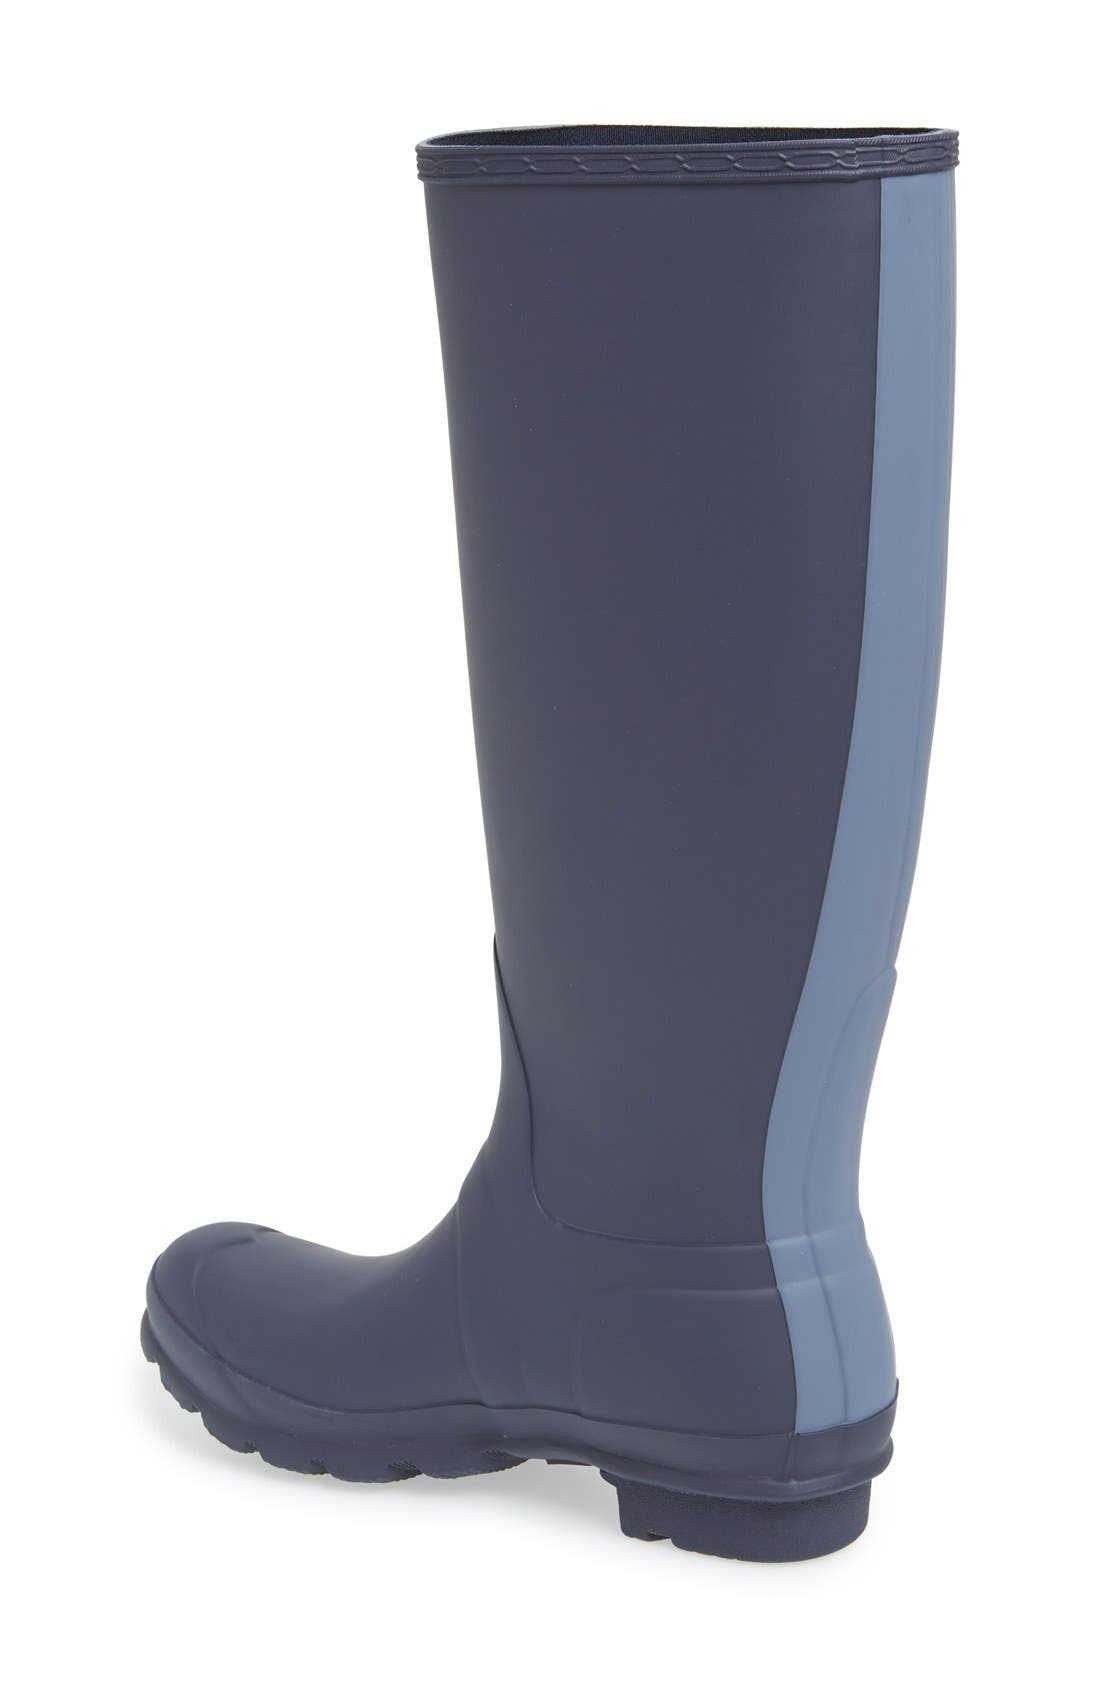 Alternate Image 2  - Hunter 'Original Stripe' Waterproof Rubber Boot (Women)